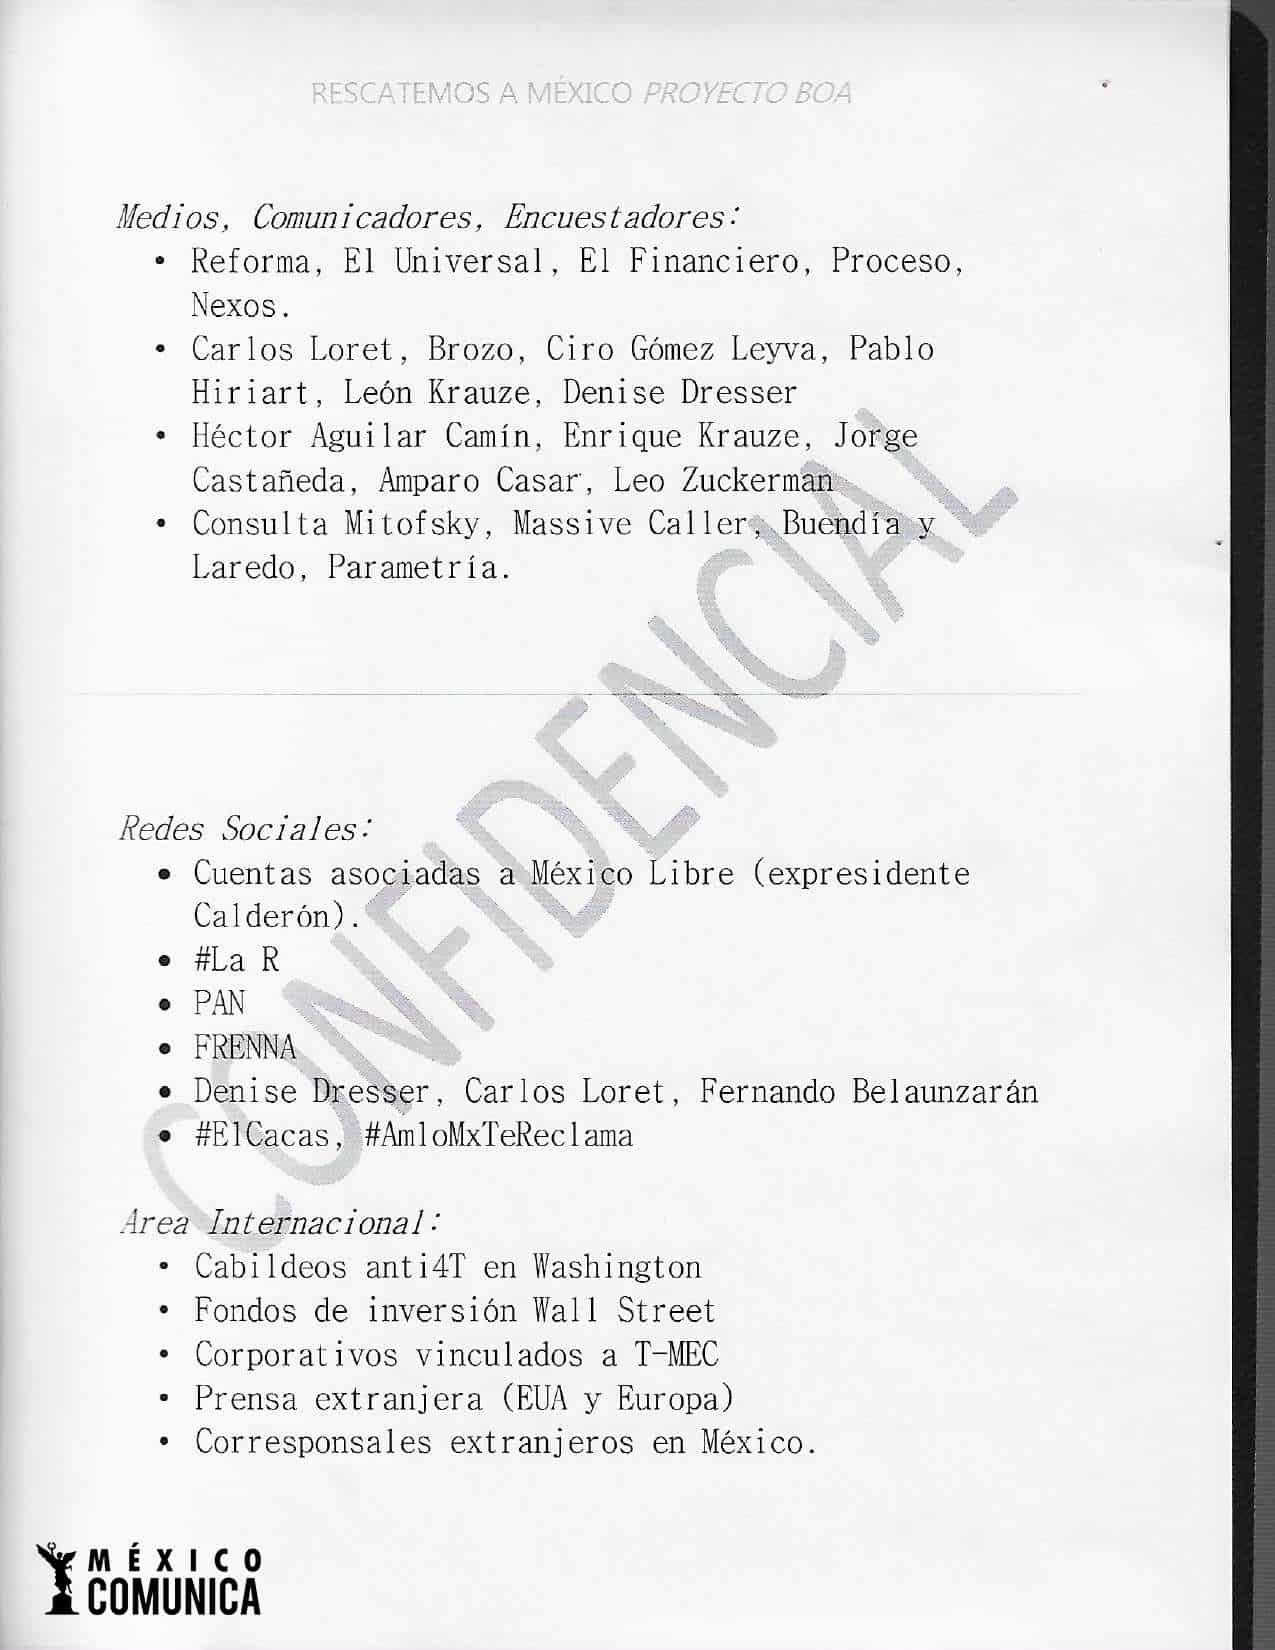 DocumentoRescatemosaMexico7